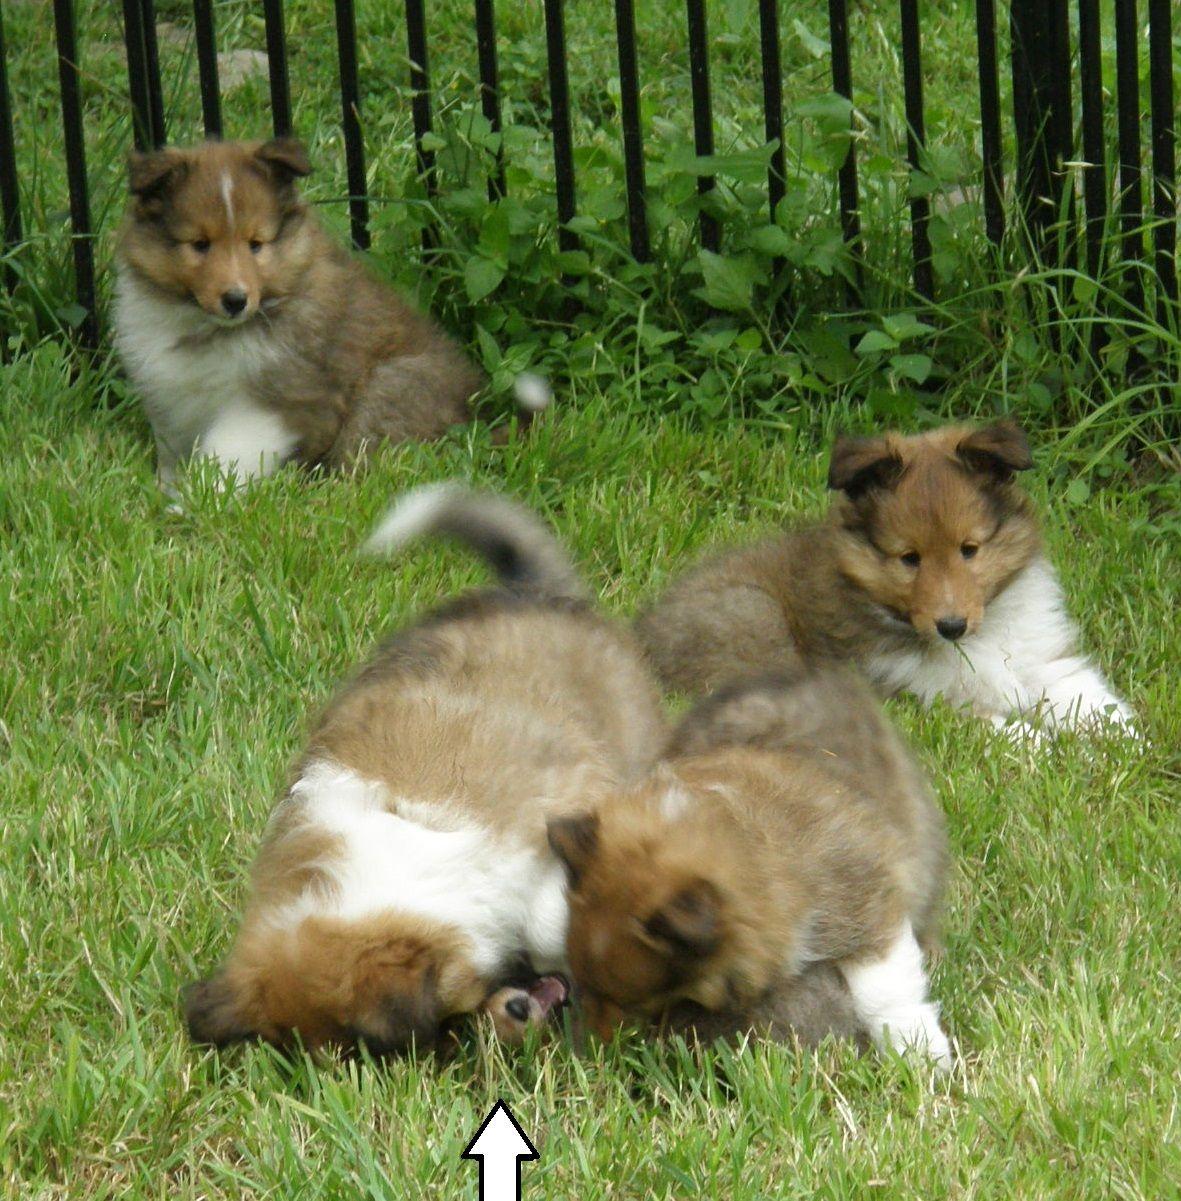 Texas Sheltie Breeders Sheltie Pups Shetland Sheepdog Puppy Lockehill Shelties Puppy Page Sheep Dog Puppy Shetland Sheepdog Puppies Sheltie